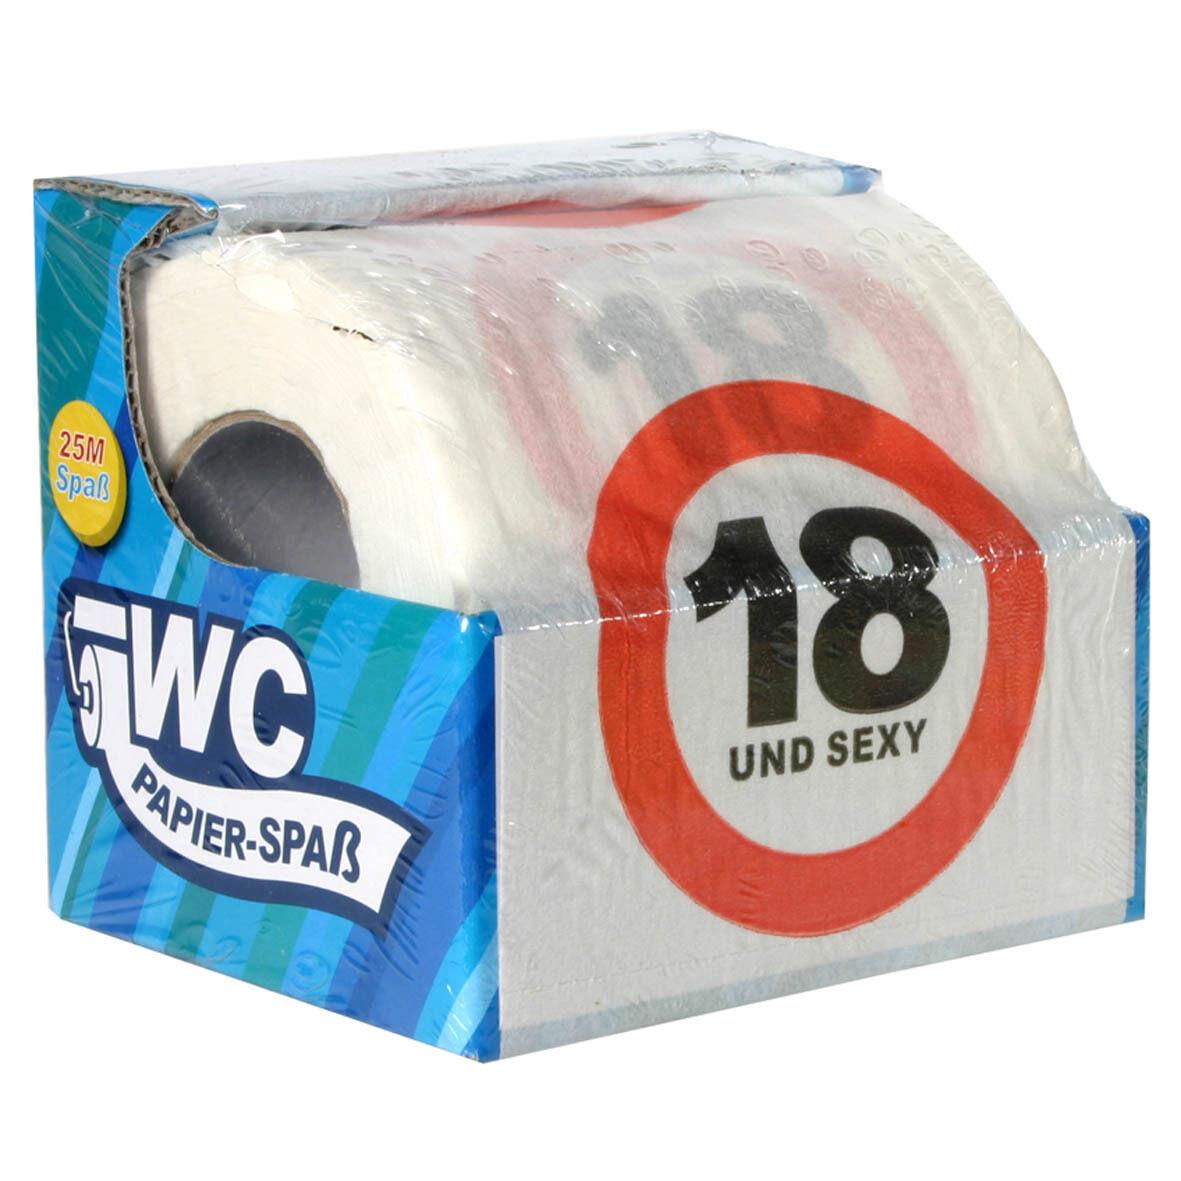 Toilettenpapier 18 20 sexy Geburtstag Klopapier 126708313 126709313 126709113